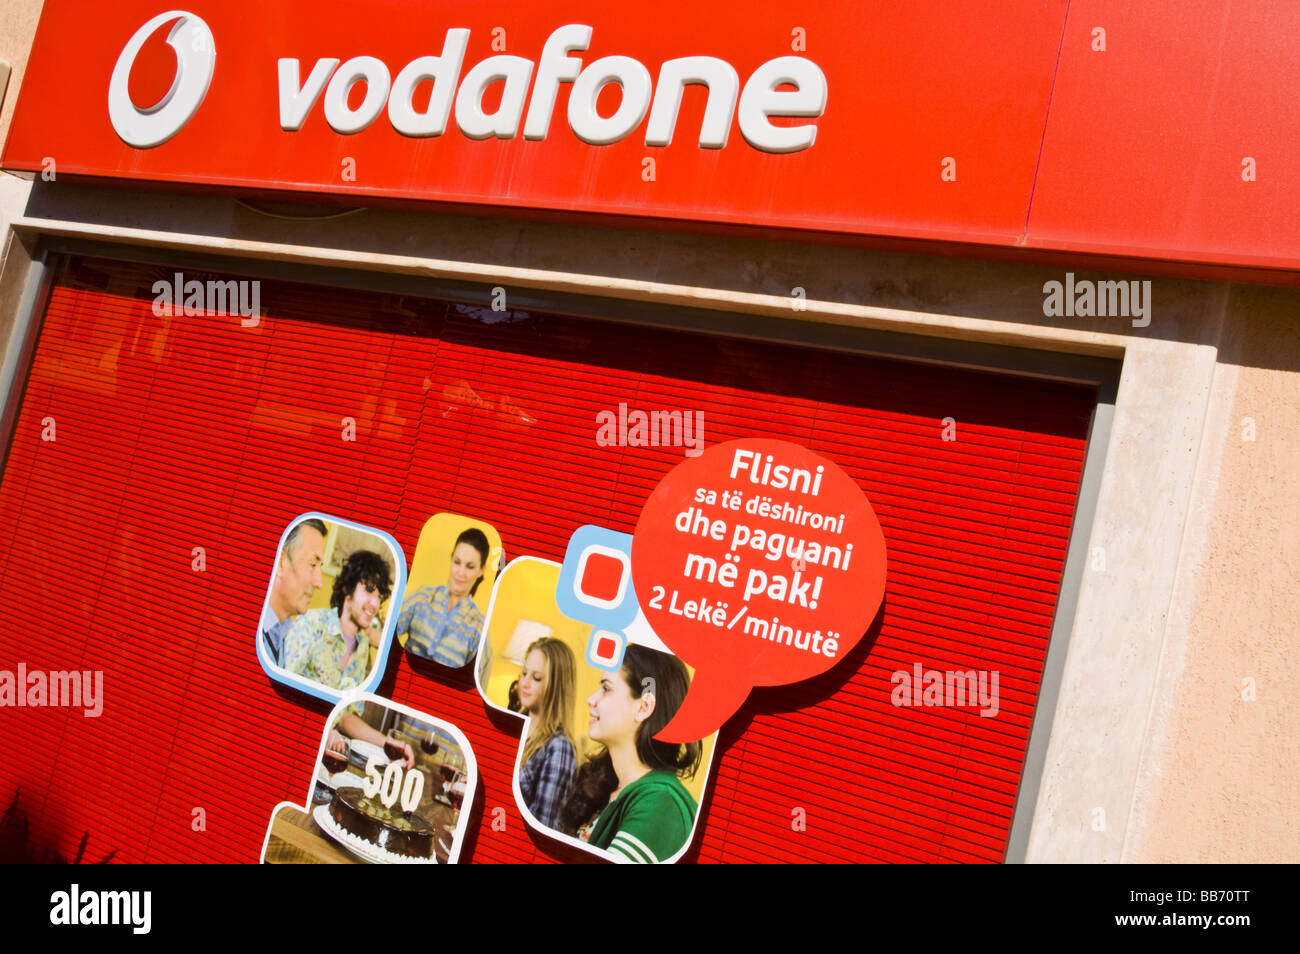 Vodafone retail store in city of Saranda Republic of Albania a tourist resort on the 'Albanian Riviera' - Stock Image